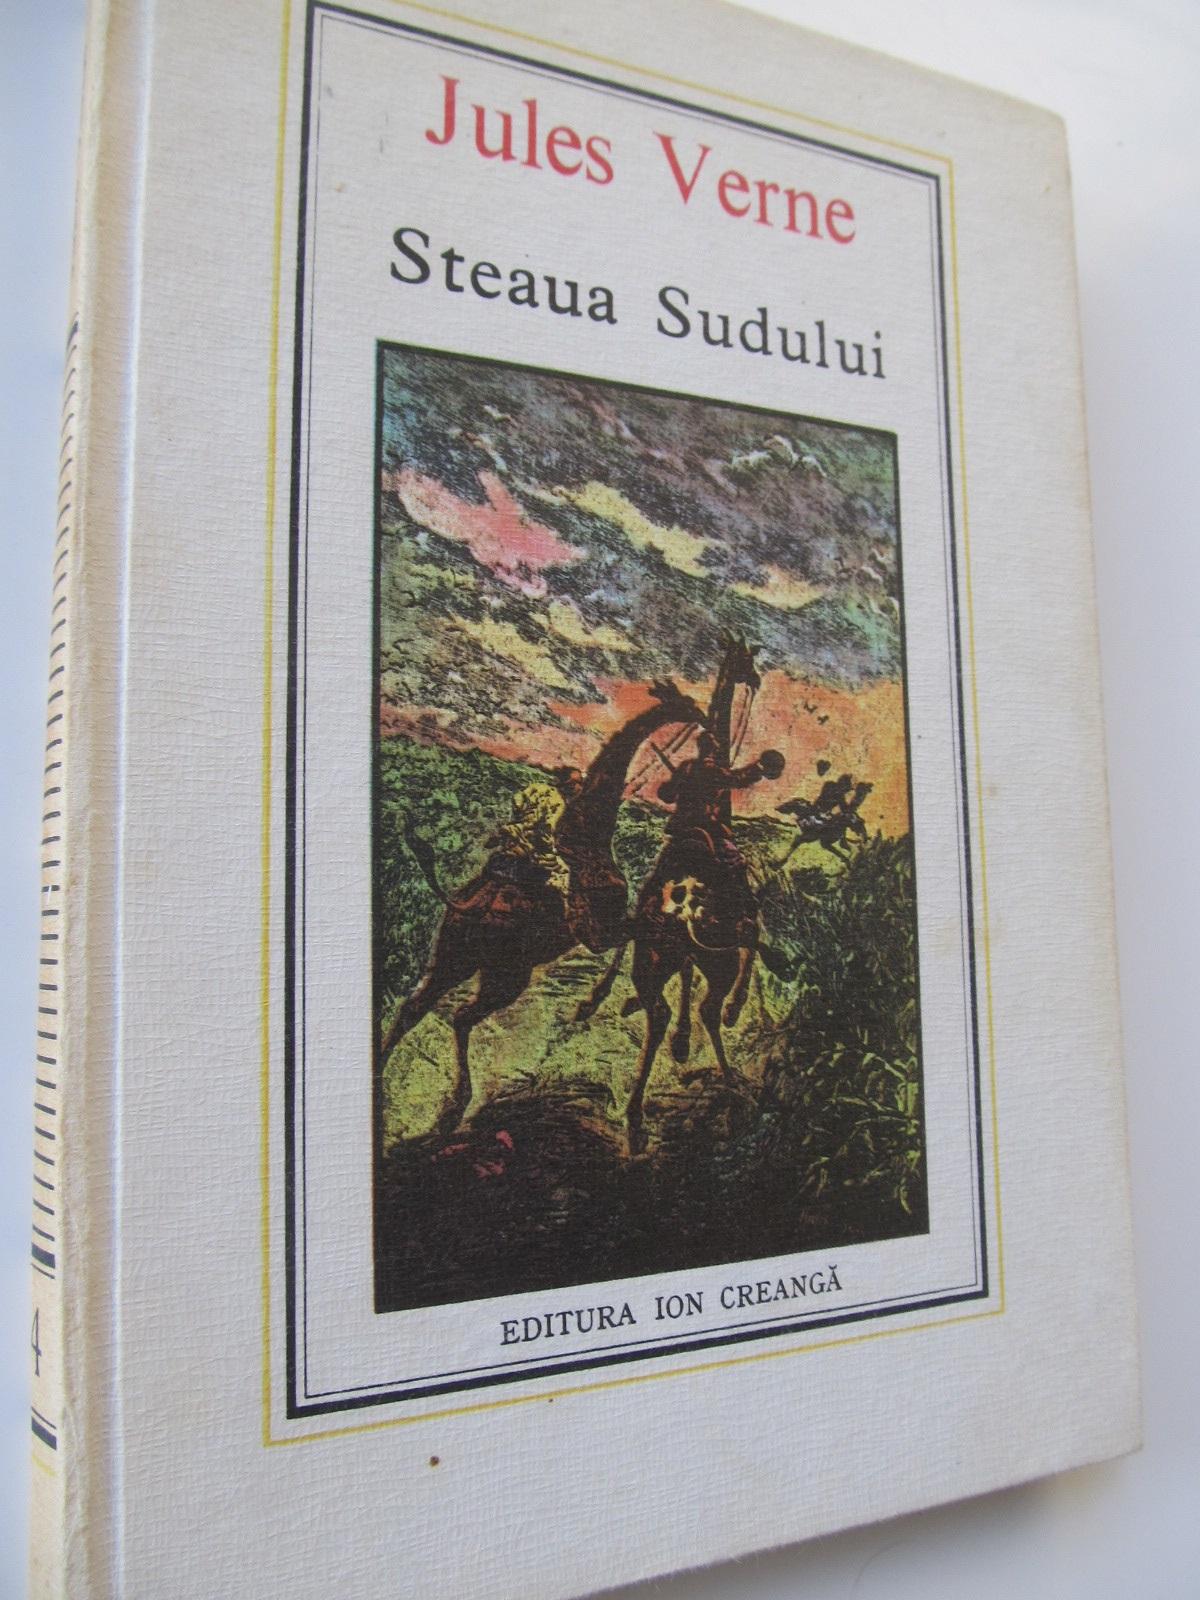 Steaua sudului (4) - Jules Verne | Detalii carte